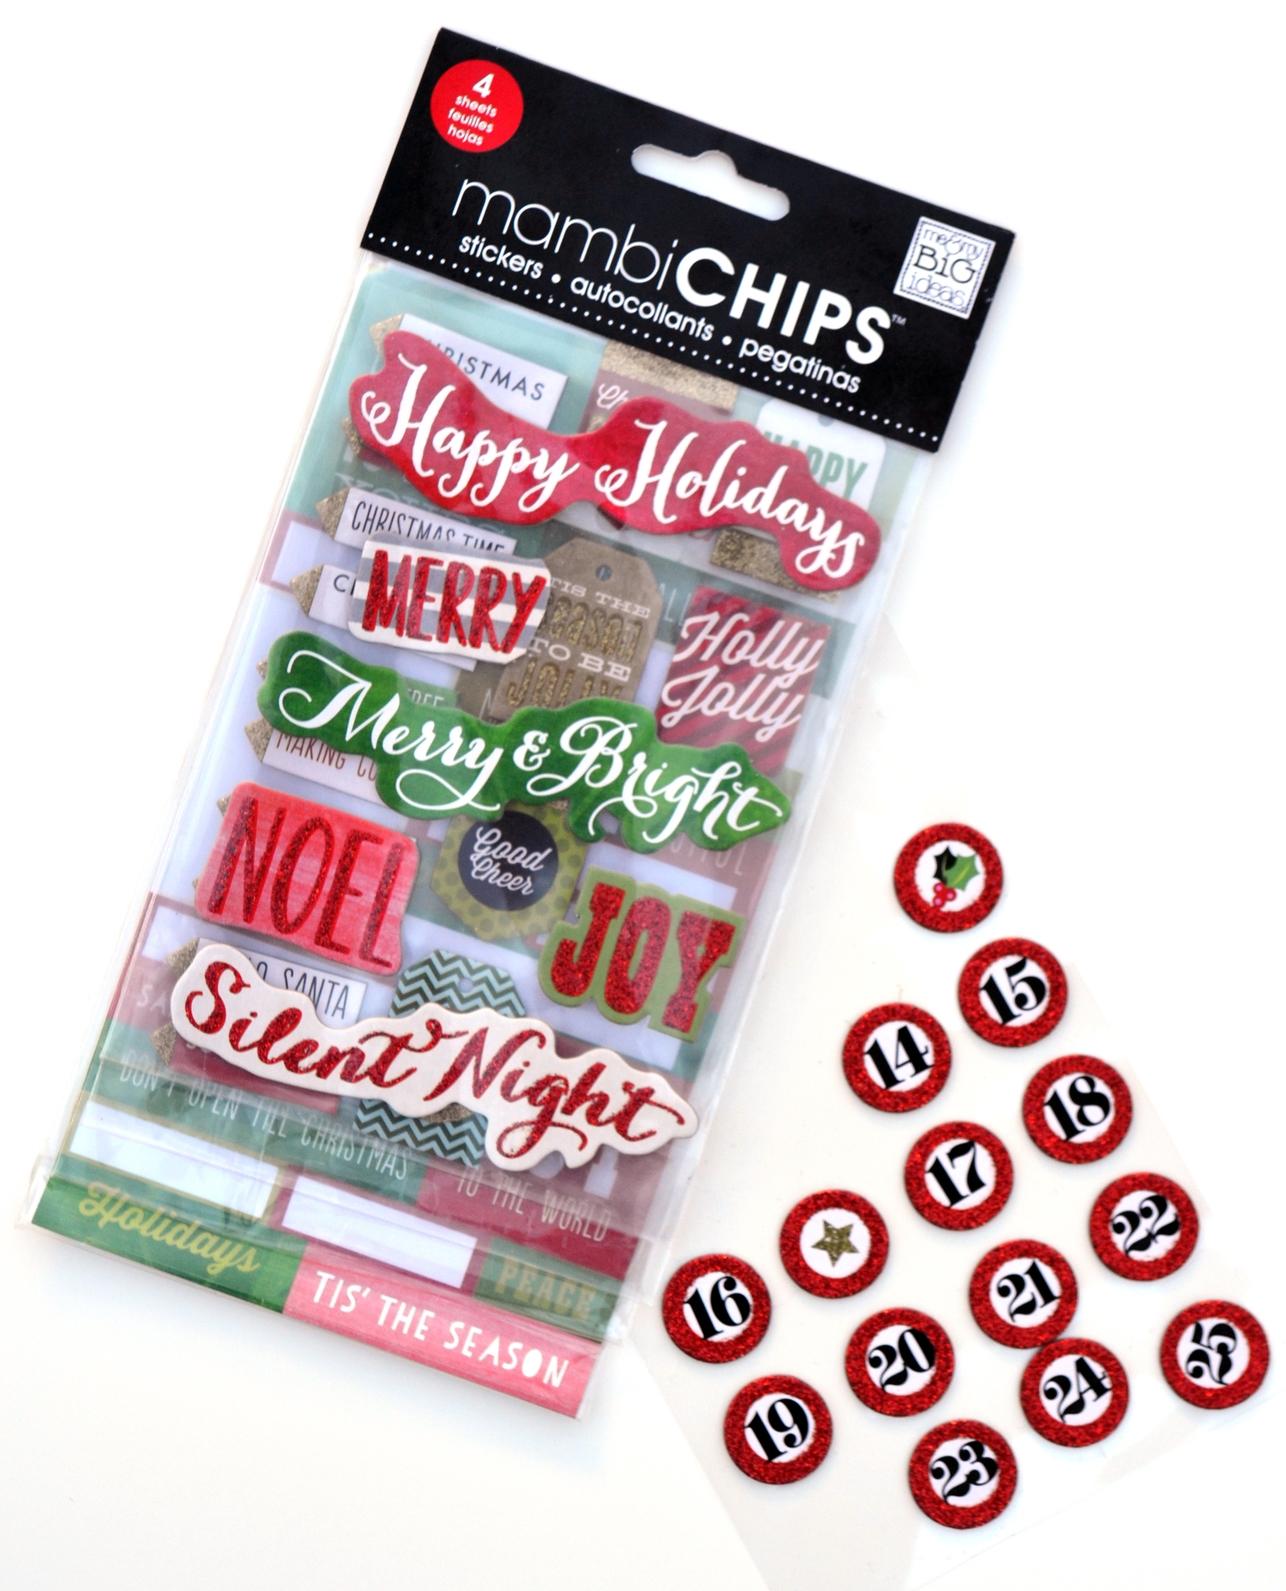 'Happy Holidays' Christmas mambiCHIPS | me & my BIG ideas